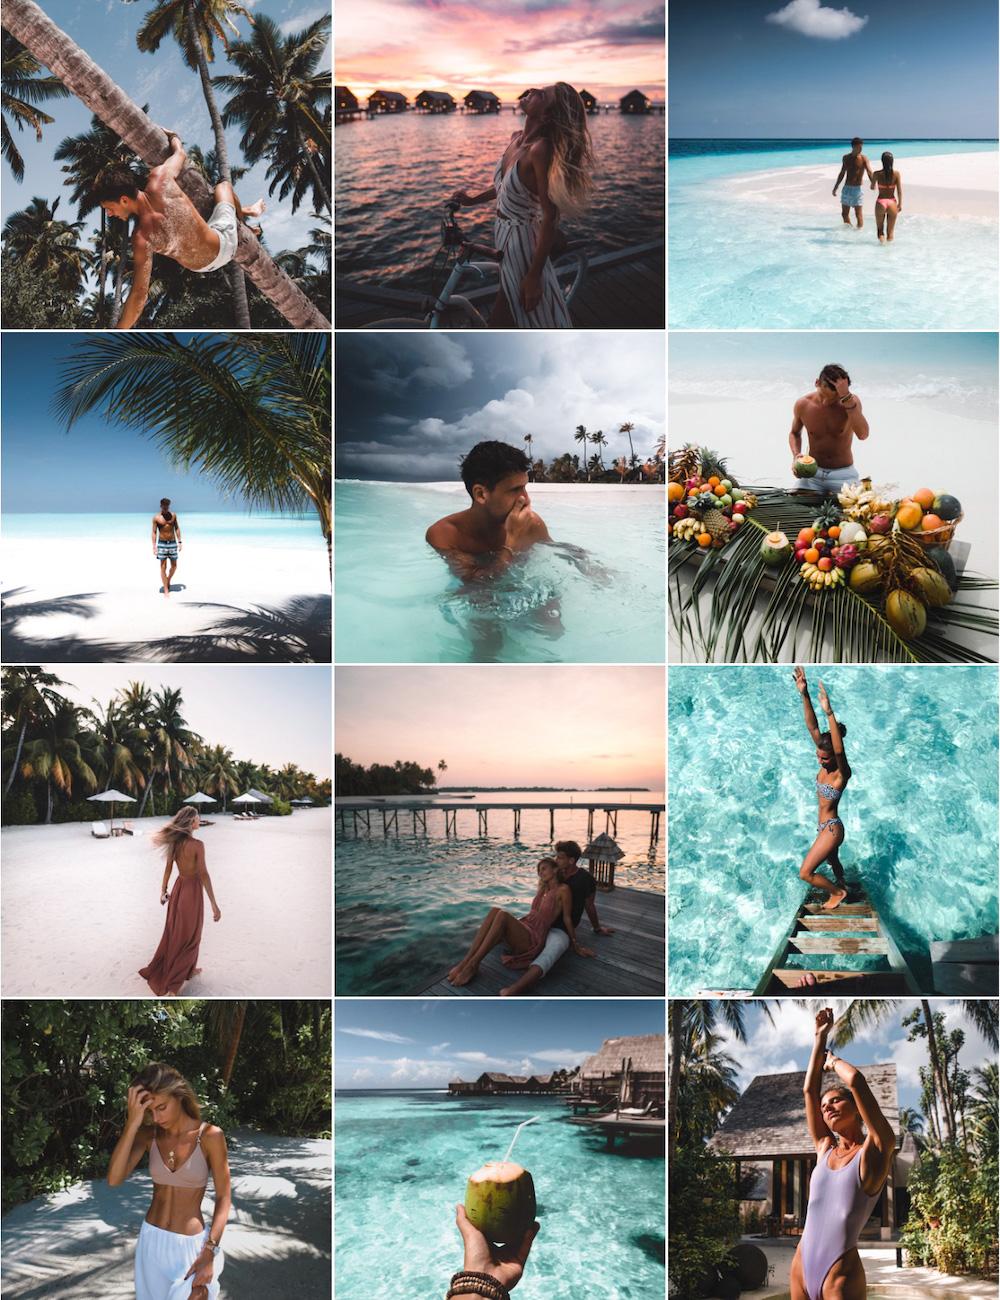 maldives_hover_feed.jpg